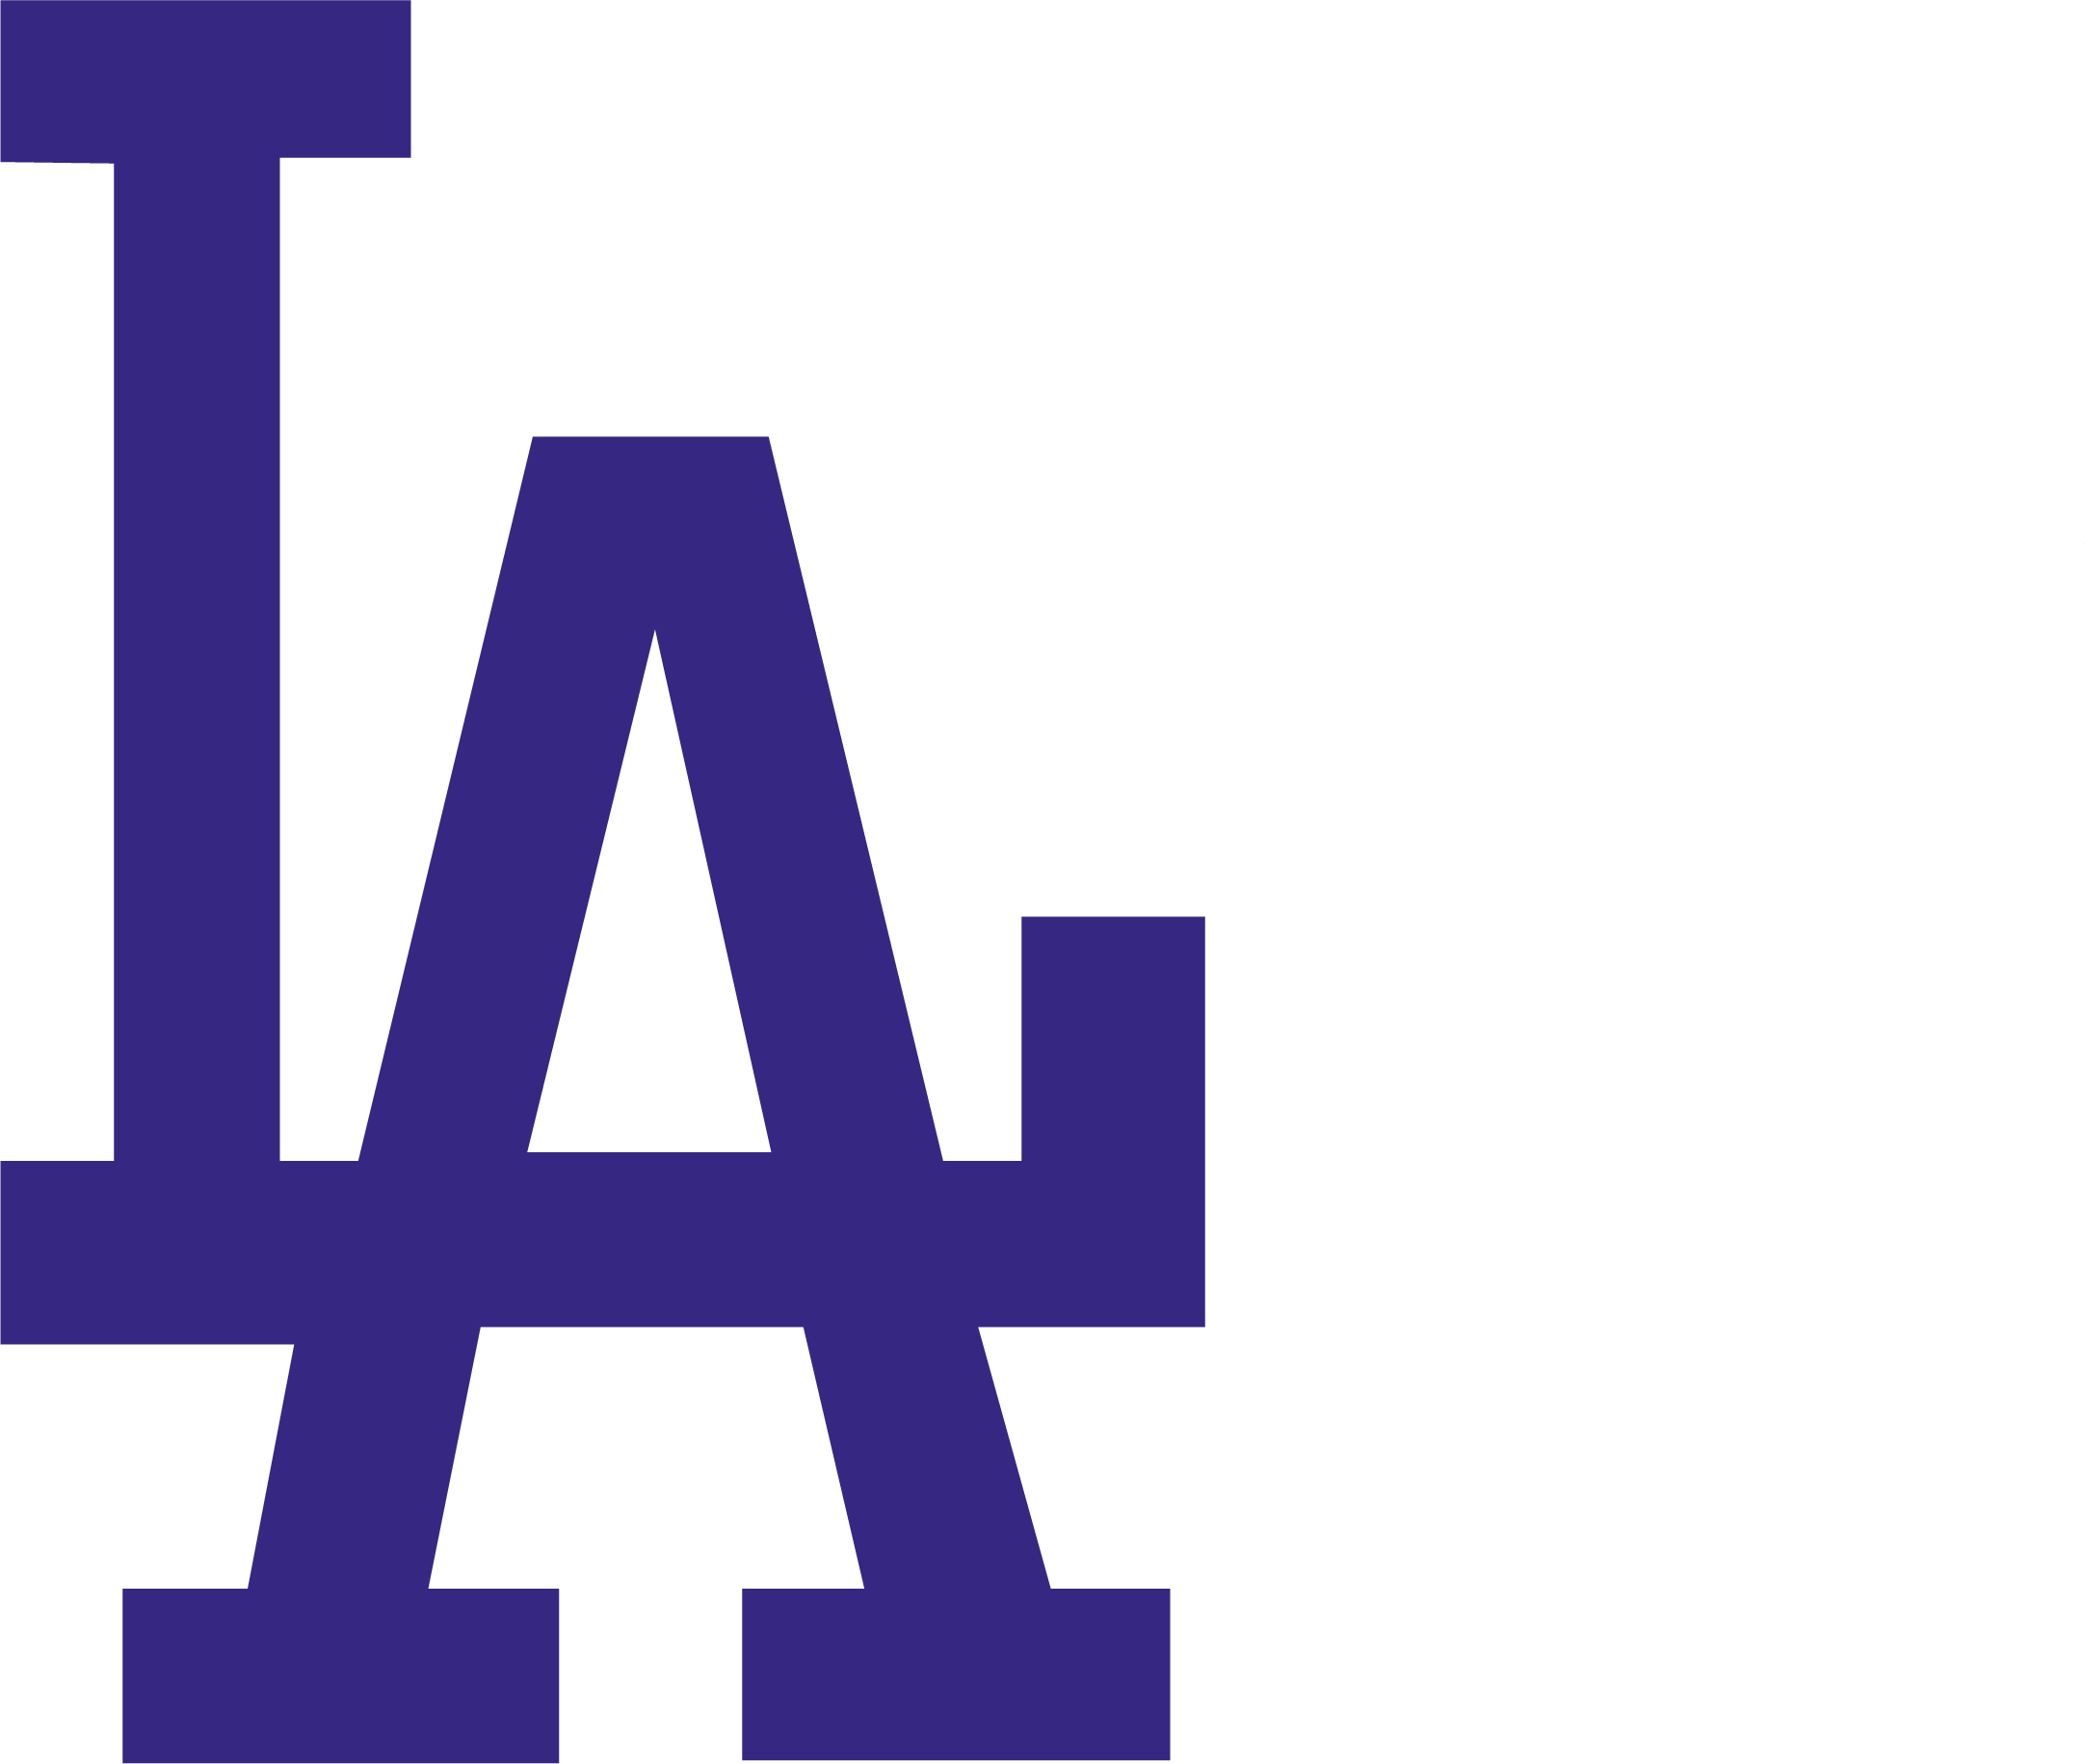 LA- Dodgers